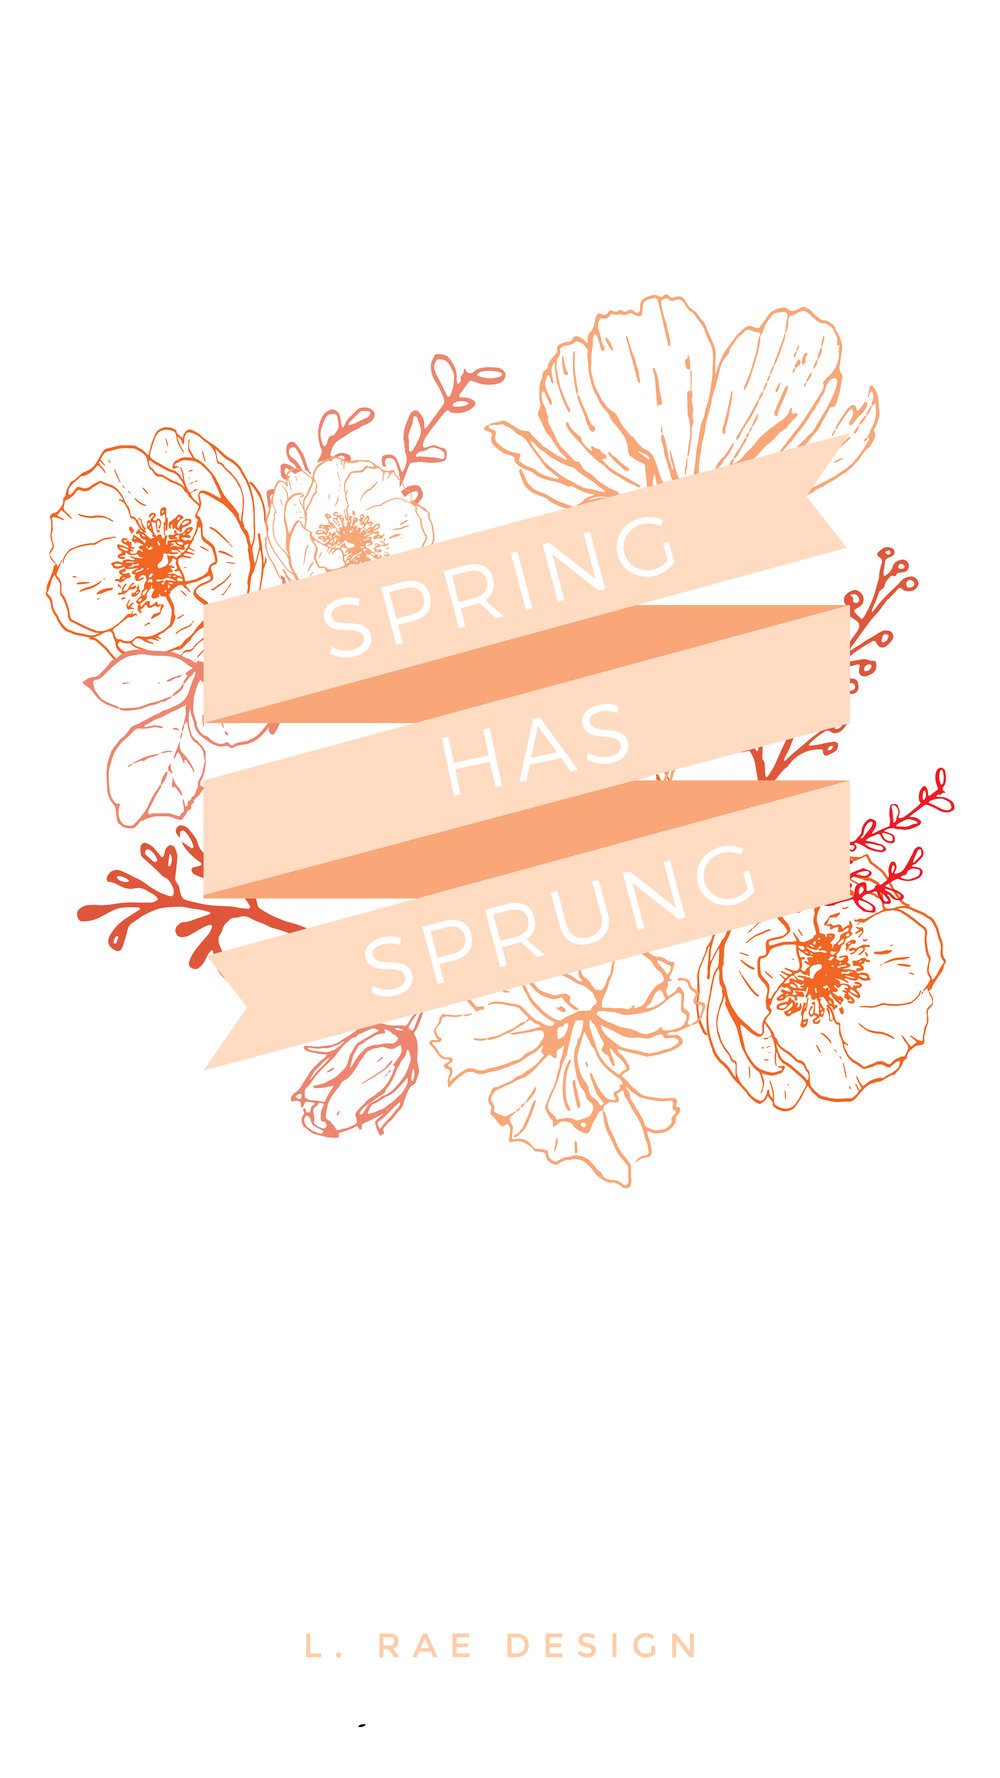 SpringHasSprung-phone.jpg